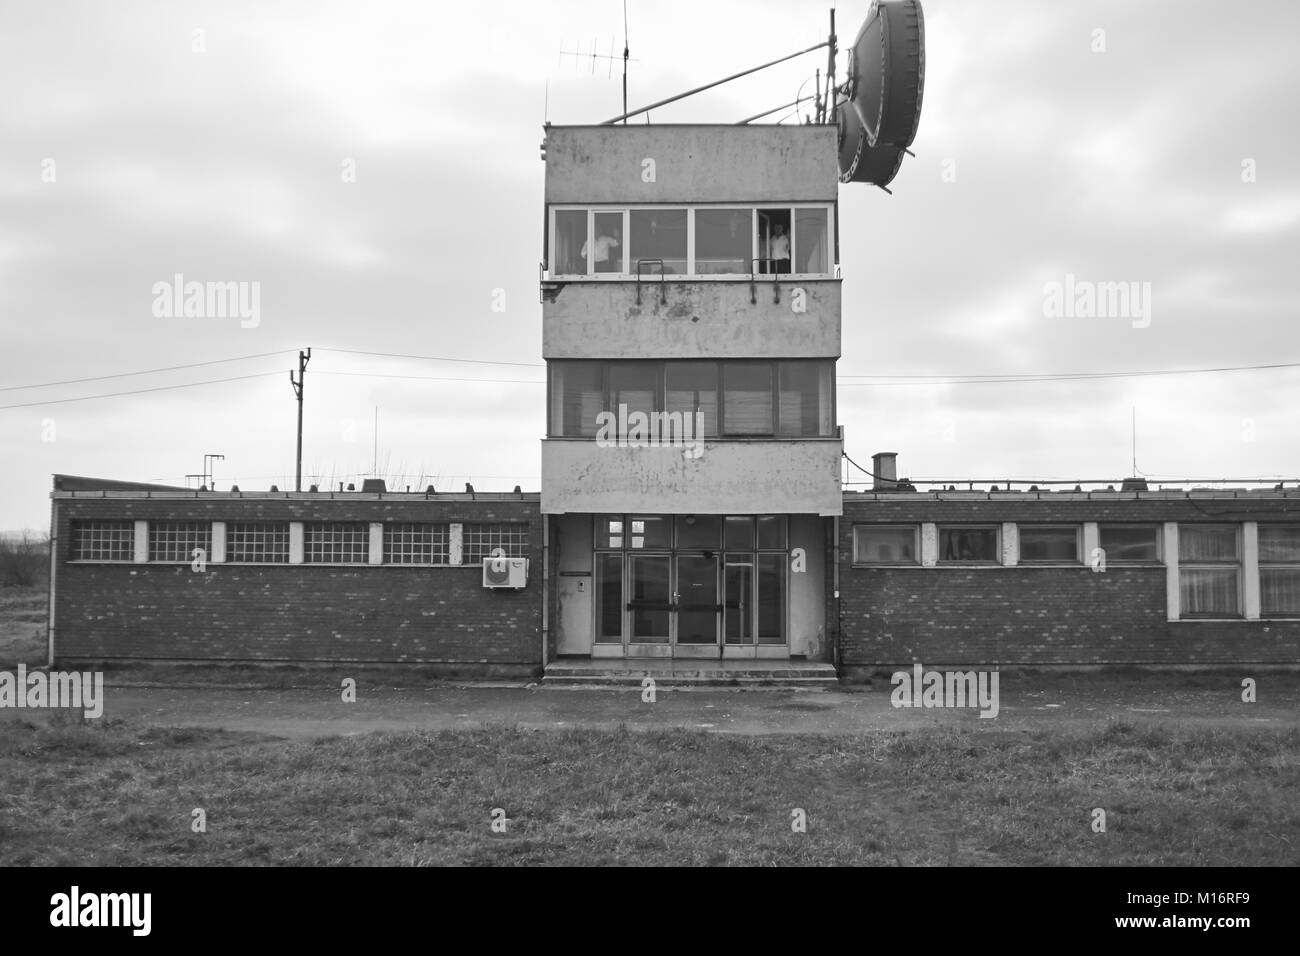 2b9ff0be3d Soviet Era Black and White Stock Photos & Images - Alamy